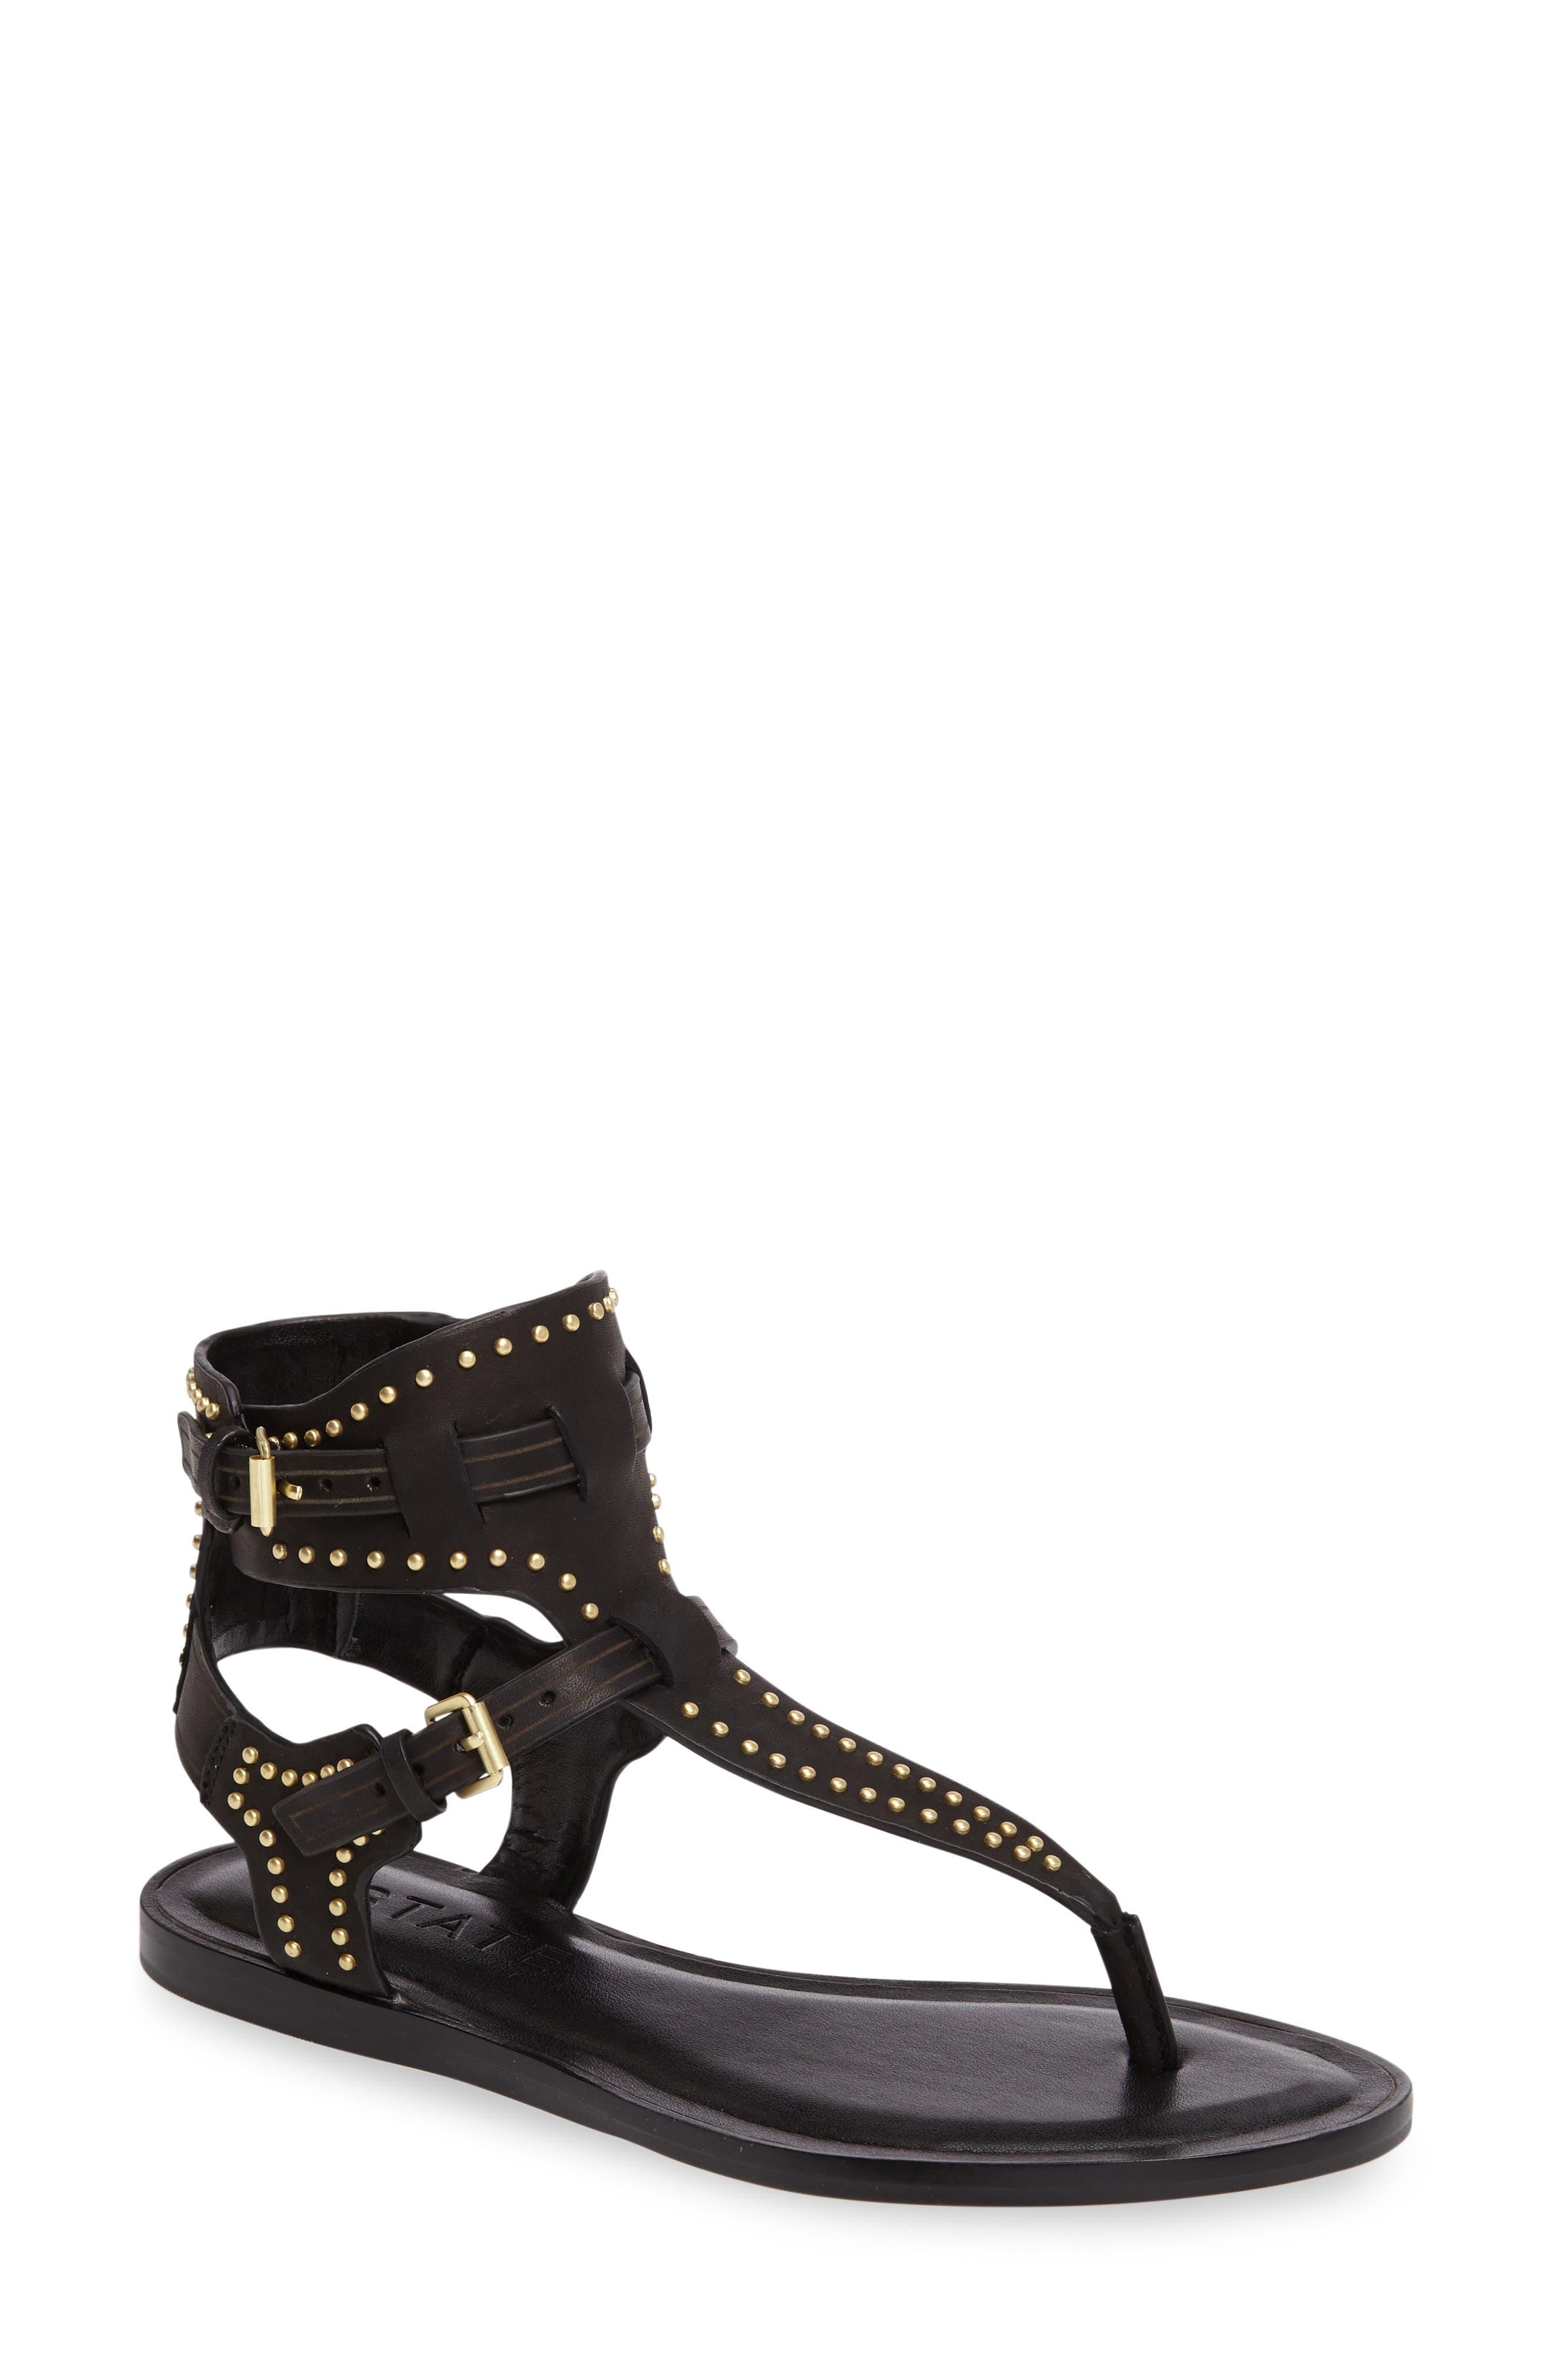 Lamanna Ankle Strap Sandal,                             Main thumbnail 1, color,                             001